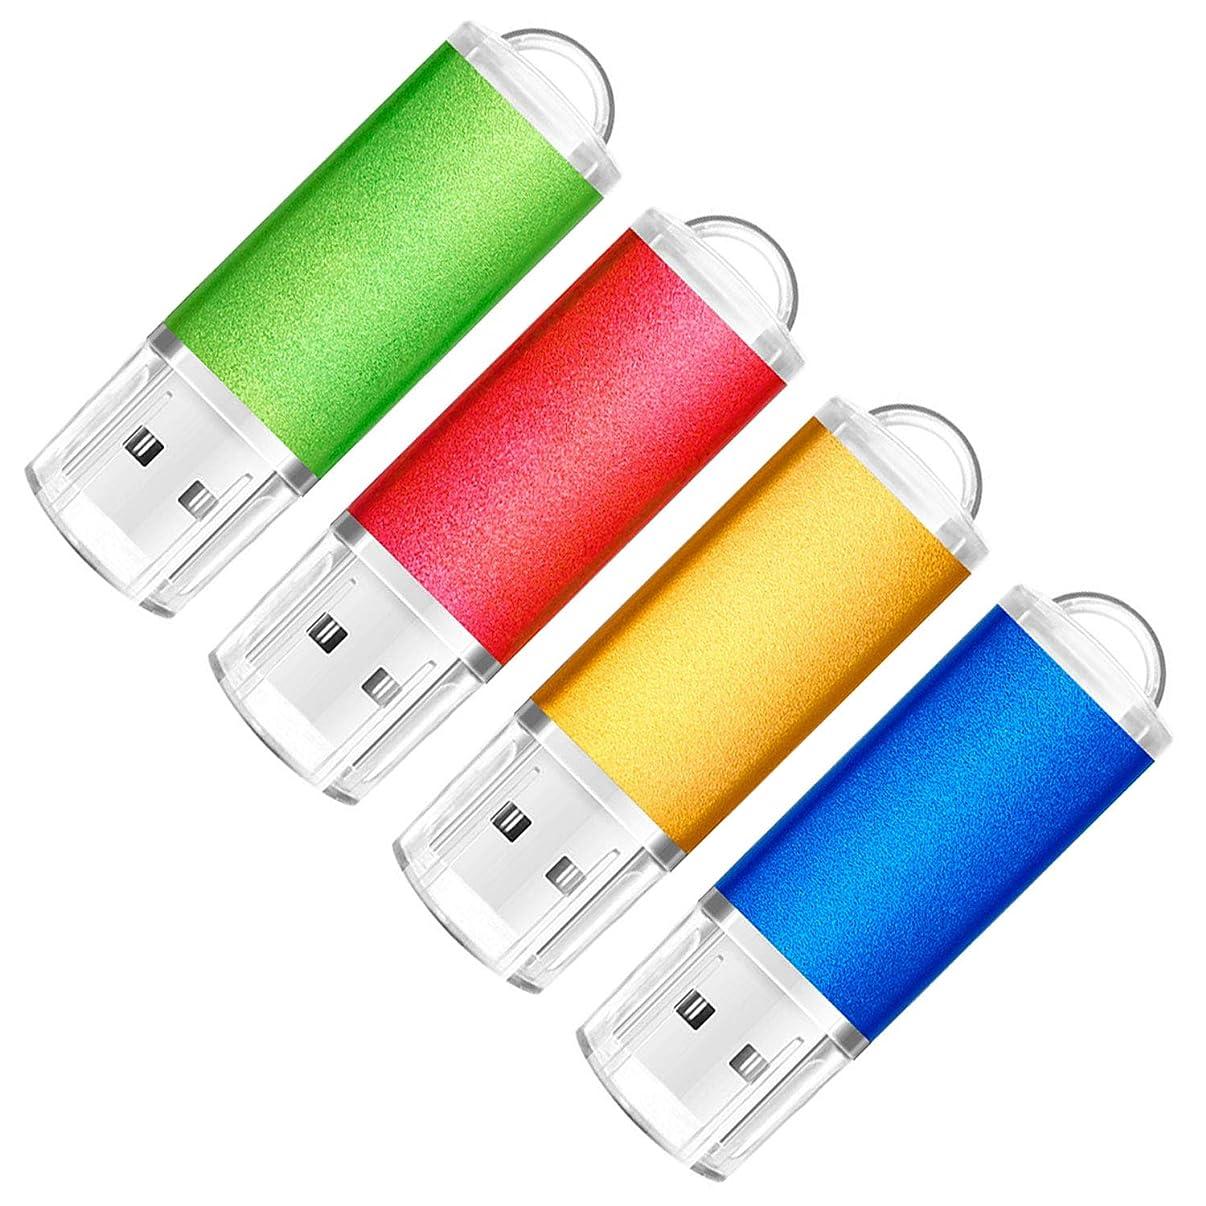 SumDuta 4 Pack 16GB USB 2.0 Flash Drive Thumb Drives Memory Stick, 4 Colors: Blue Green Gold Red